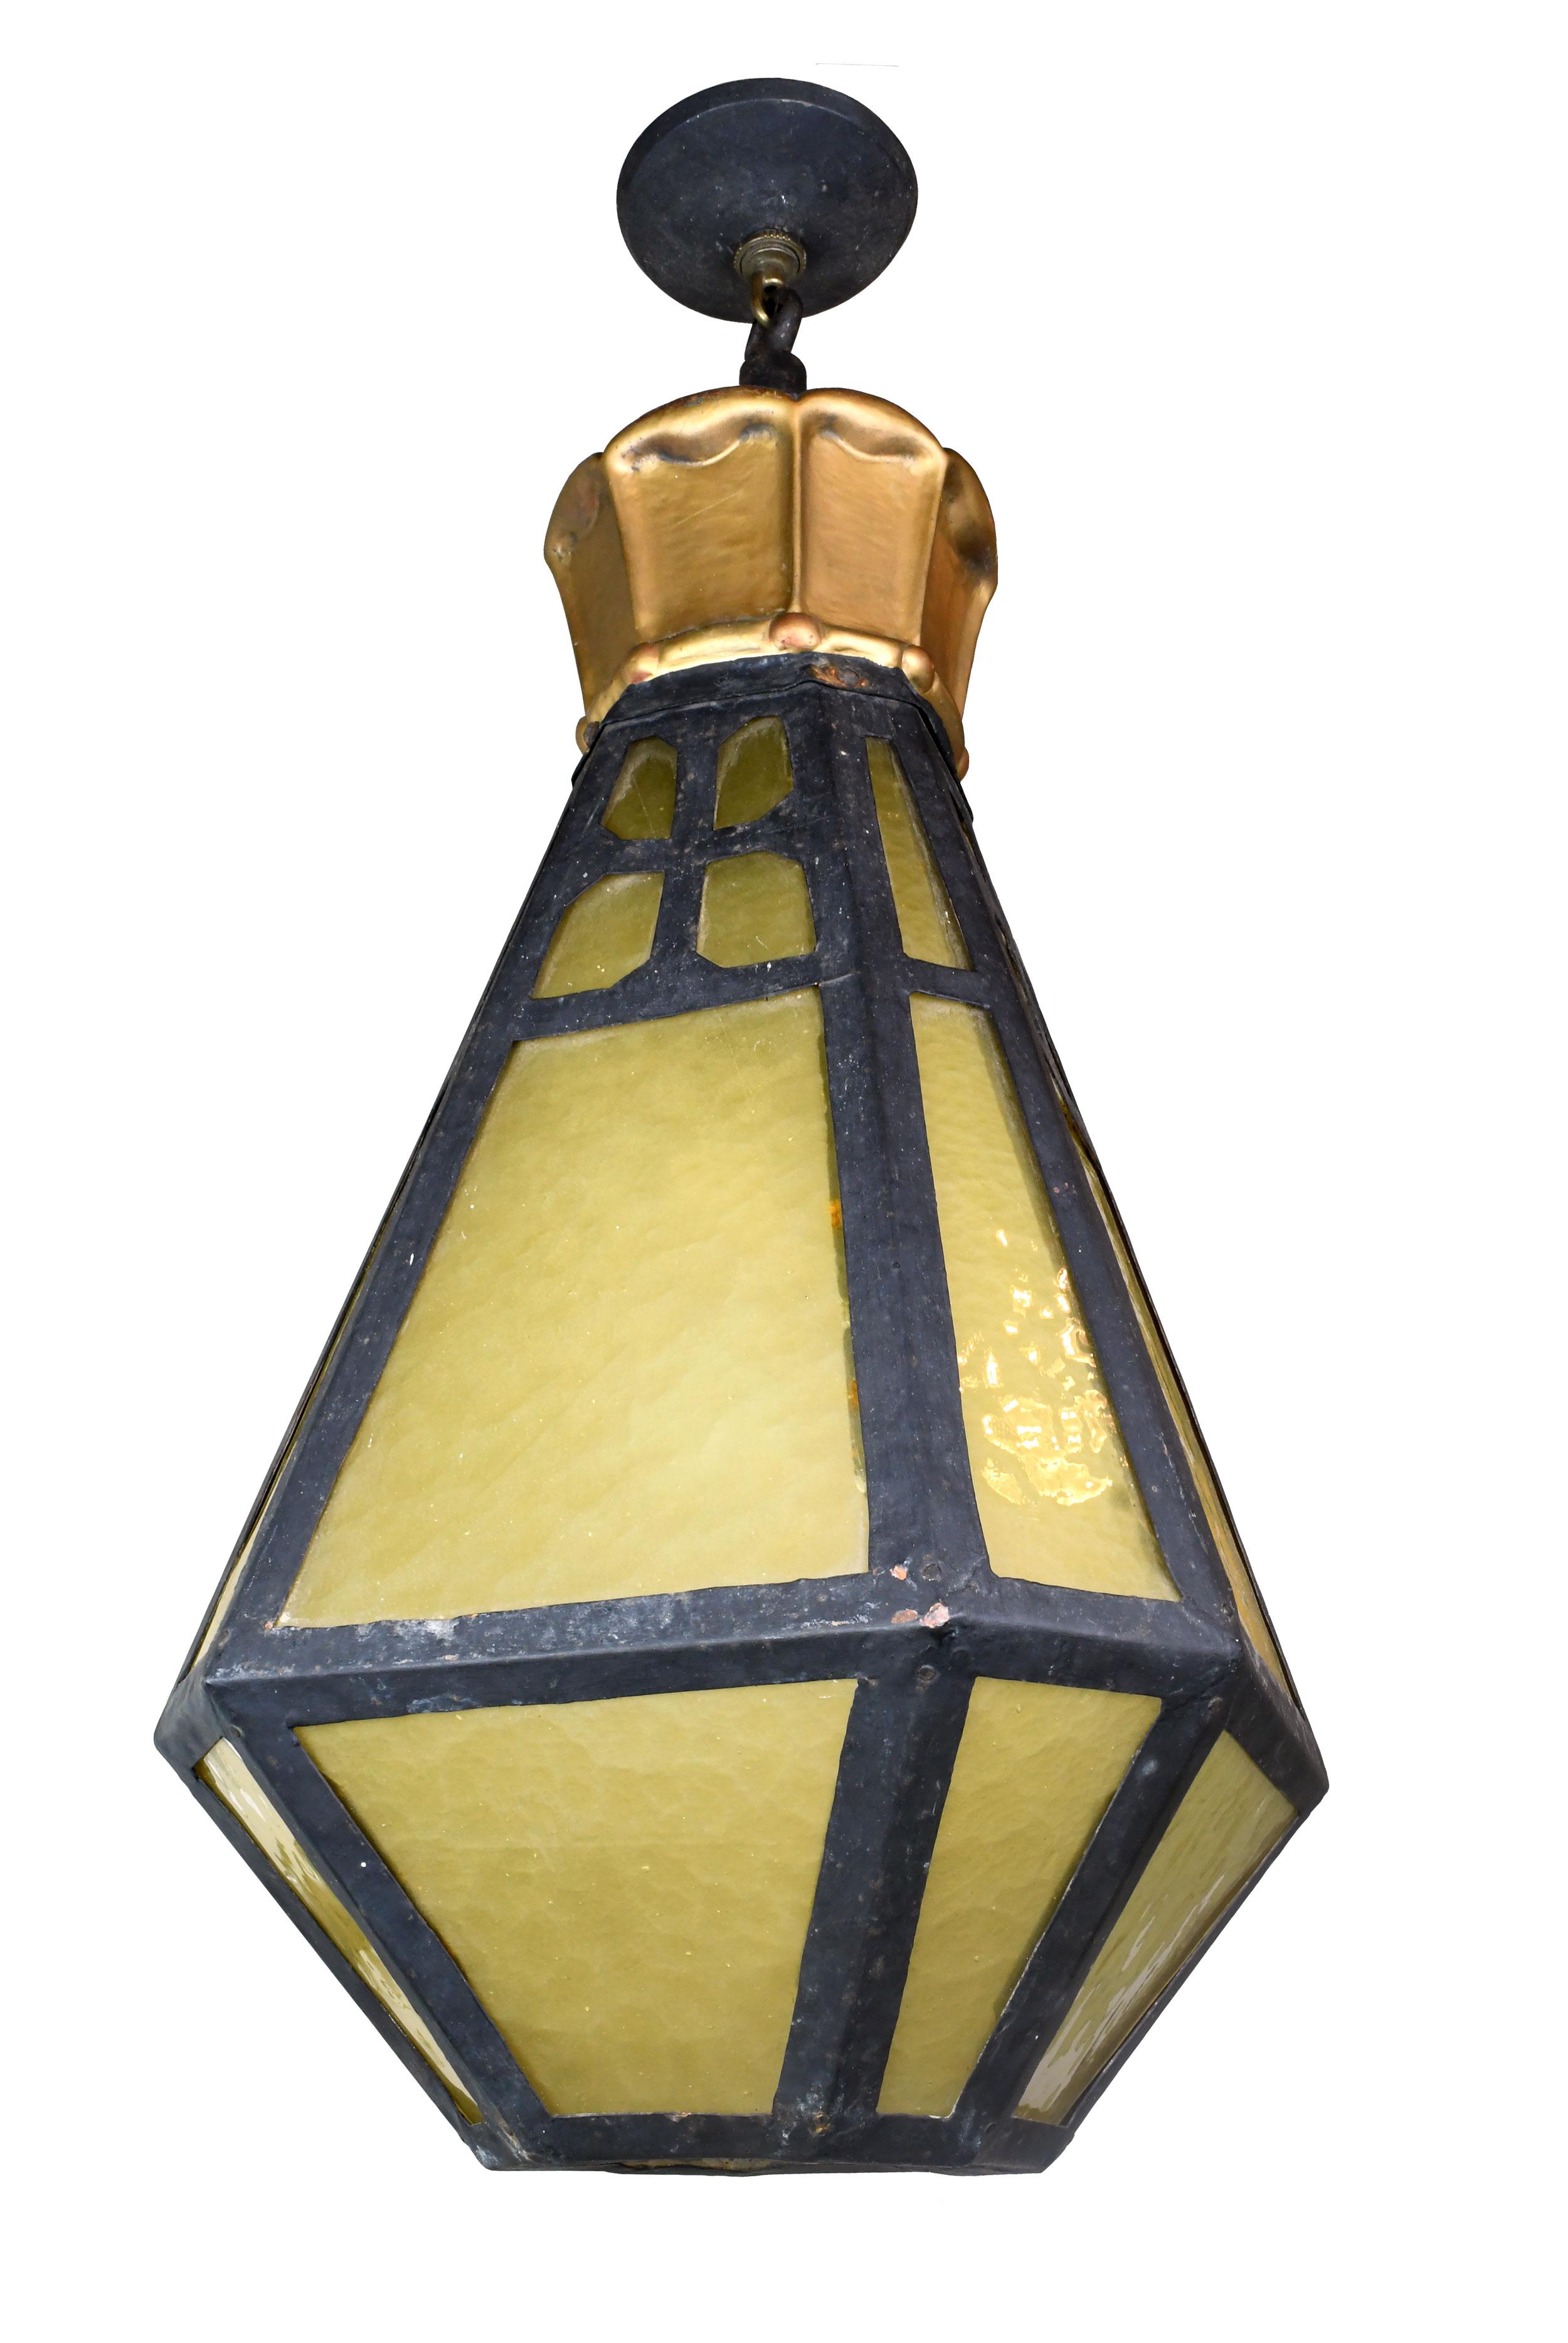 47330-amber-six-sided-pendant-lower-angle.jpg